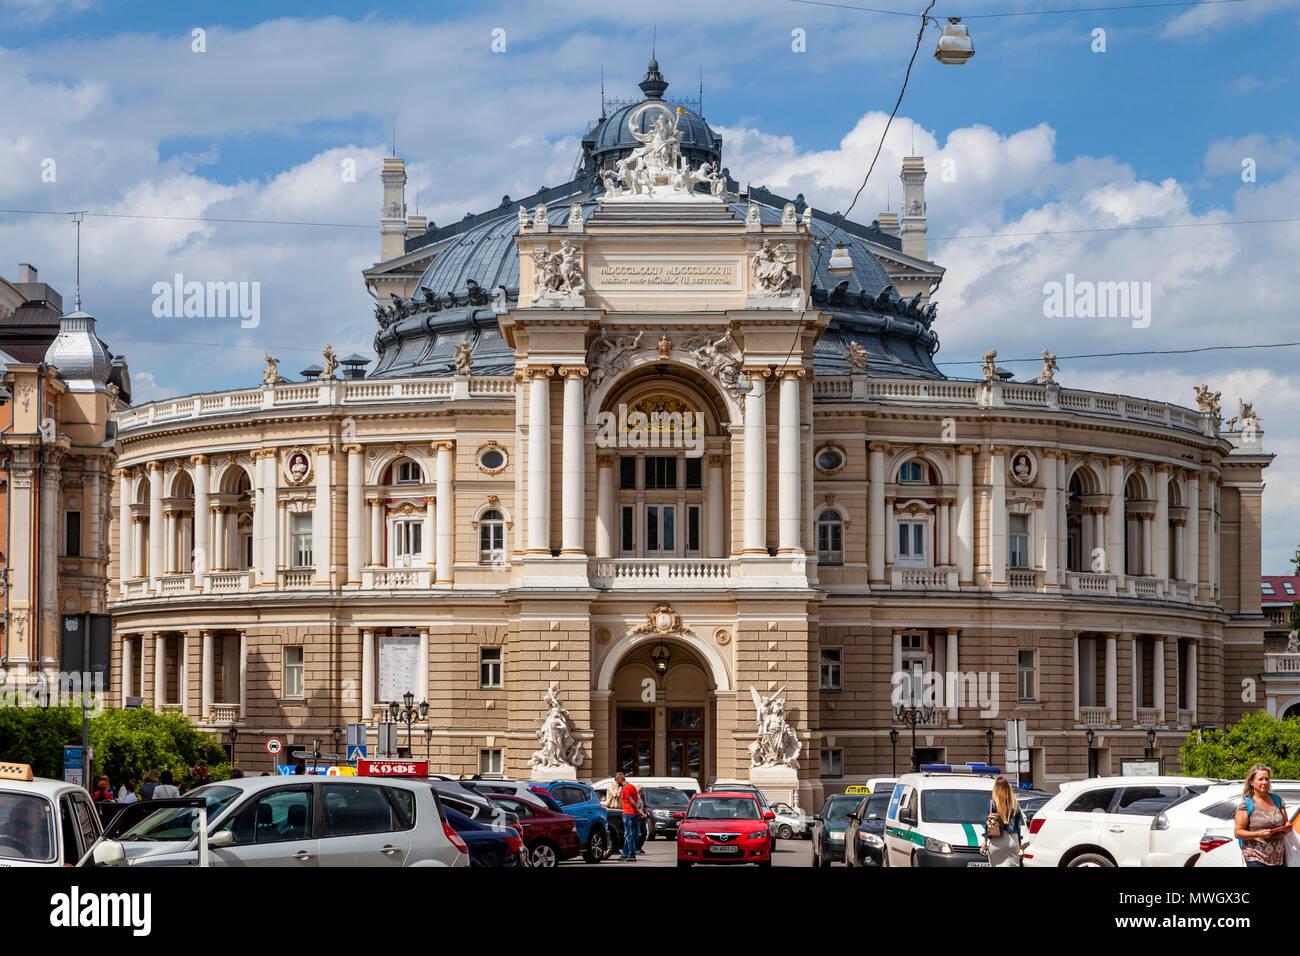 The Odessa National Academic Theatre of Opera and Ballet, Odessa, Ukraine. - Stock Image